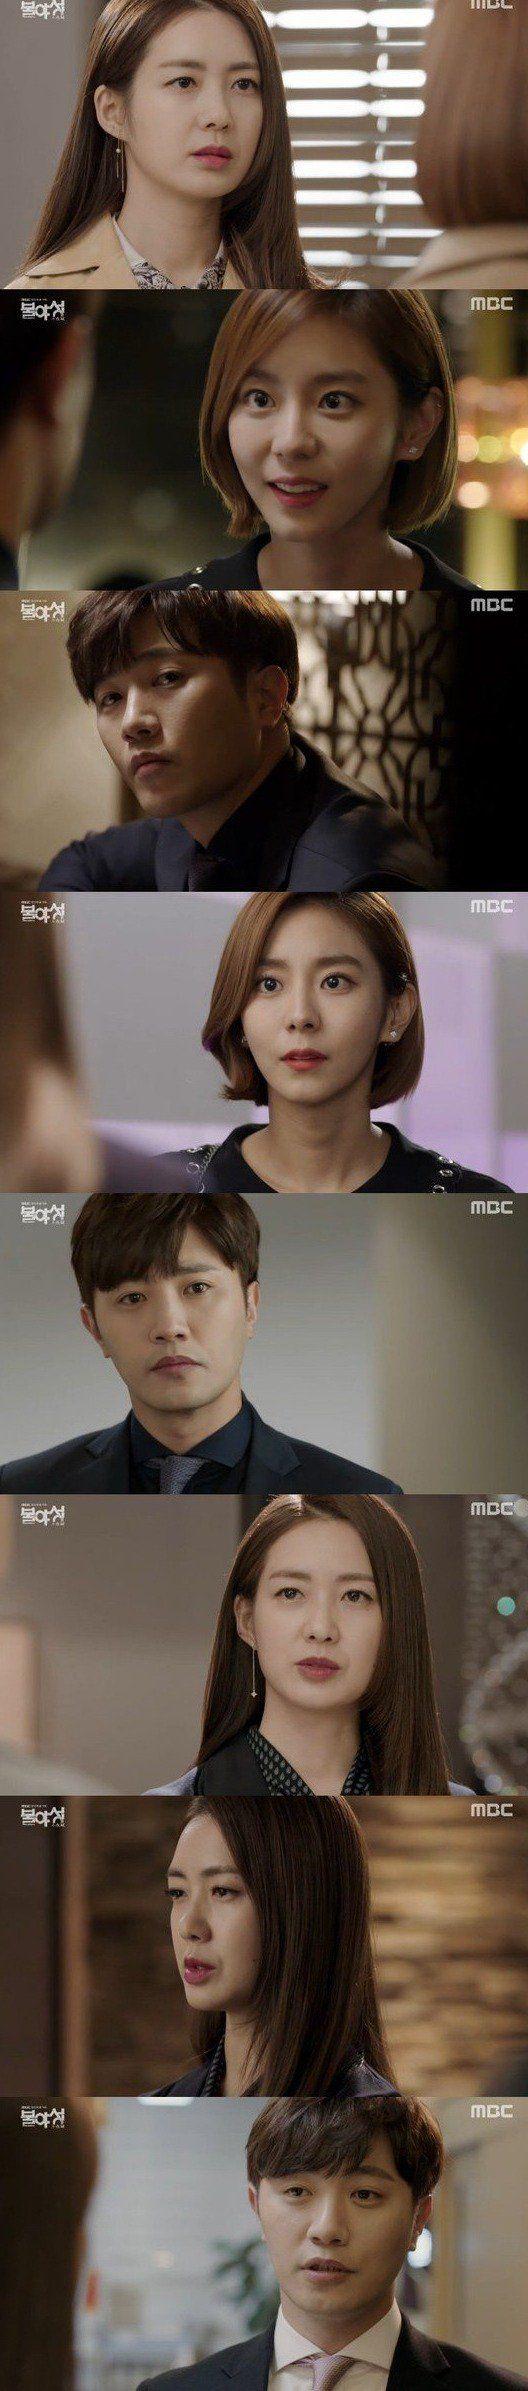 Night light korean drama synopsis -  Spoiler Added Episode 7 Captures For The Kdrama Night Light